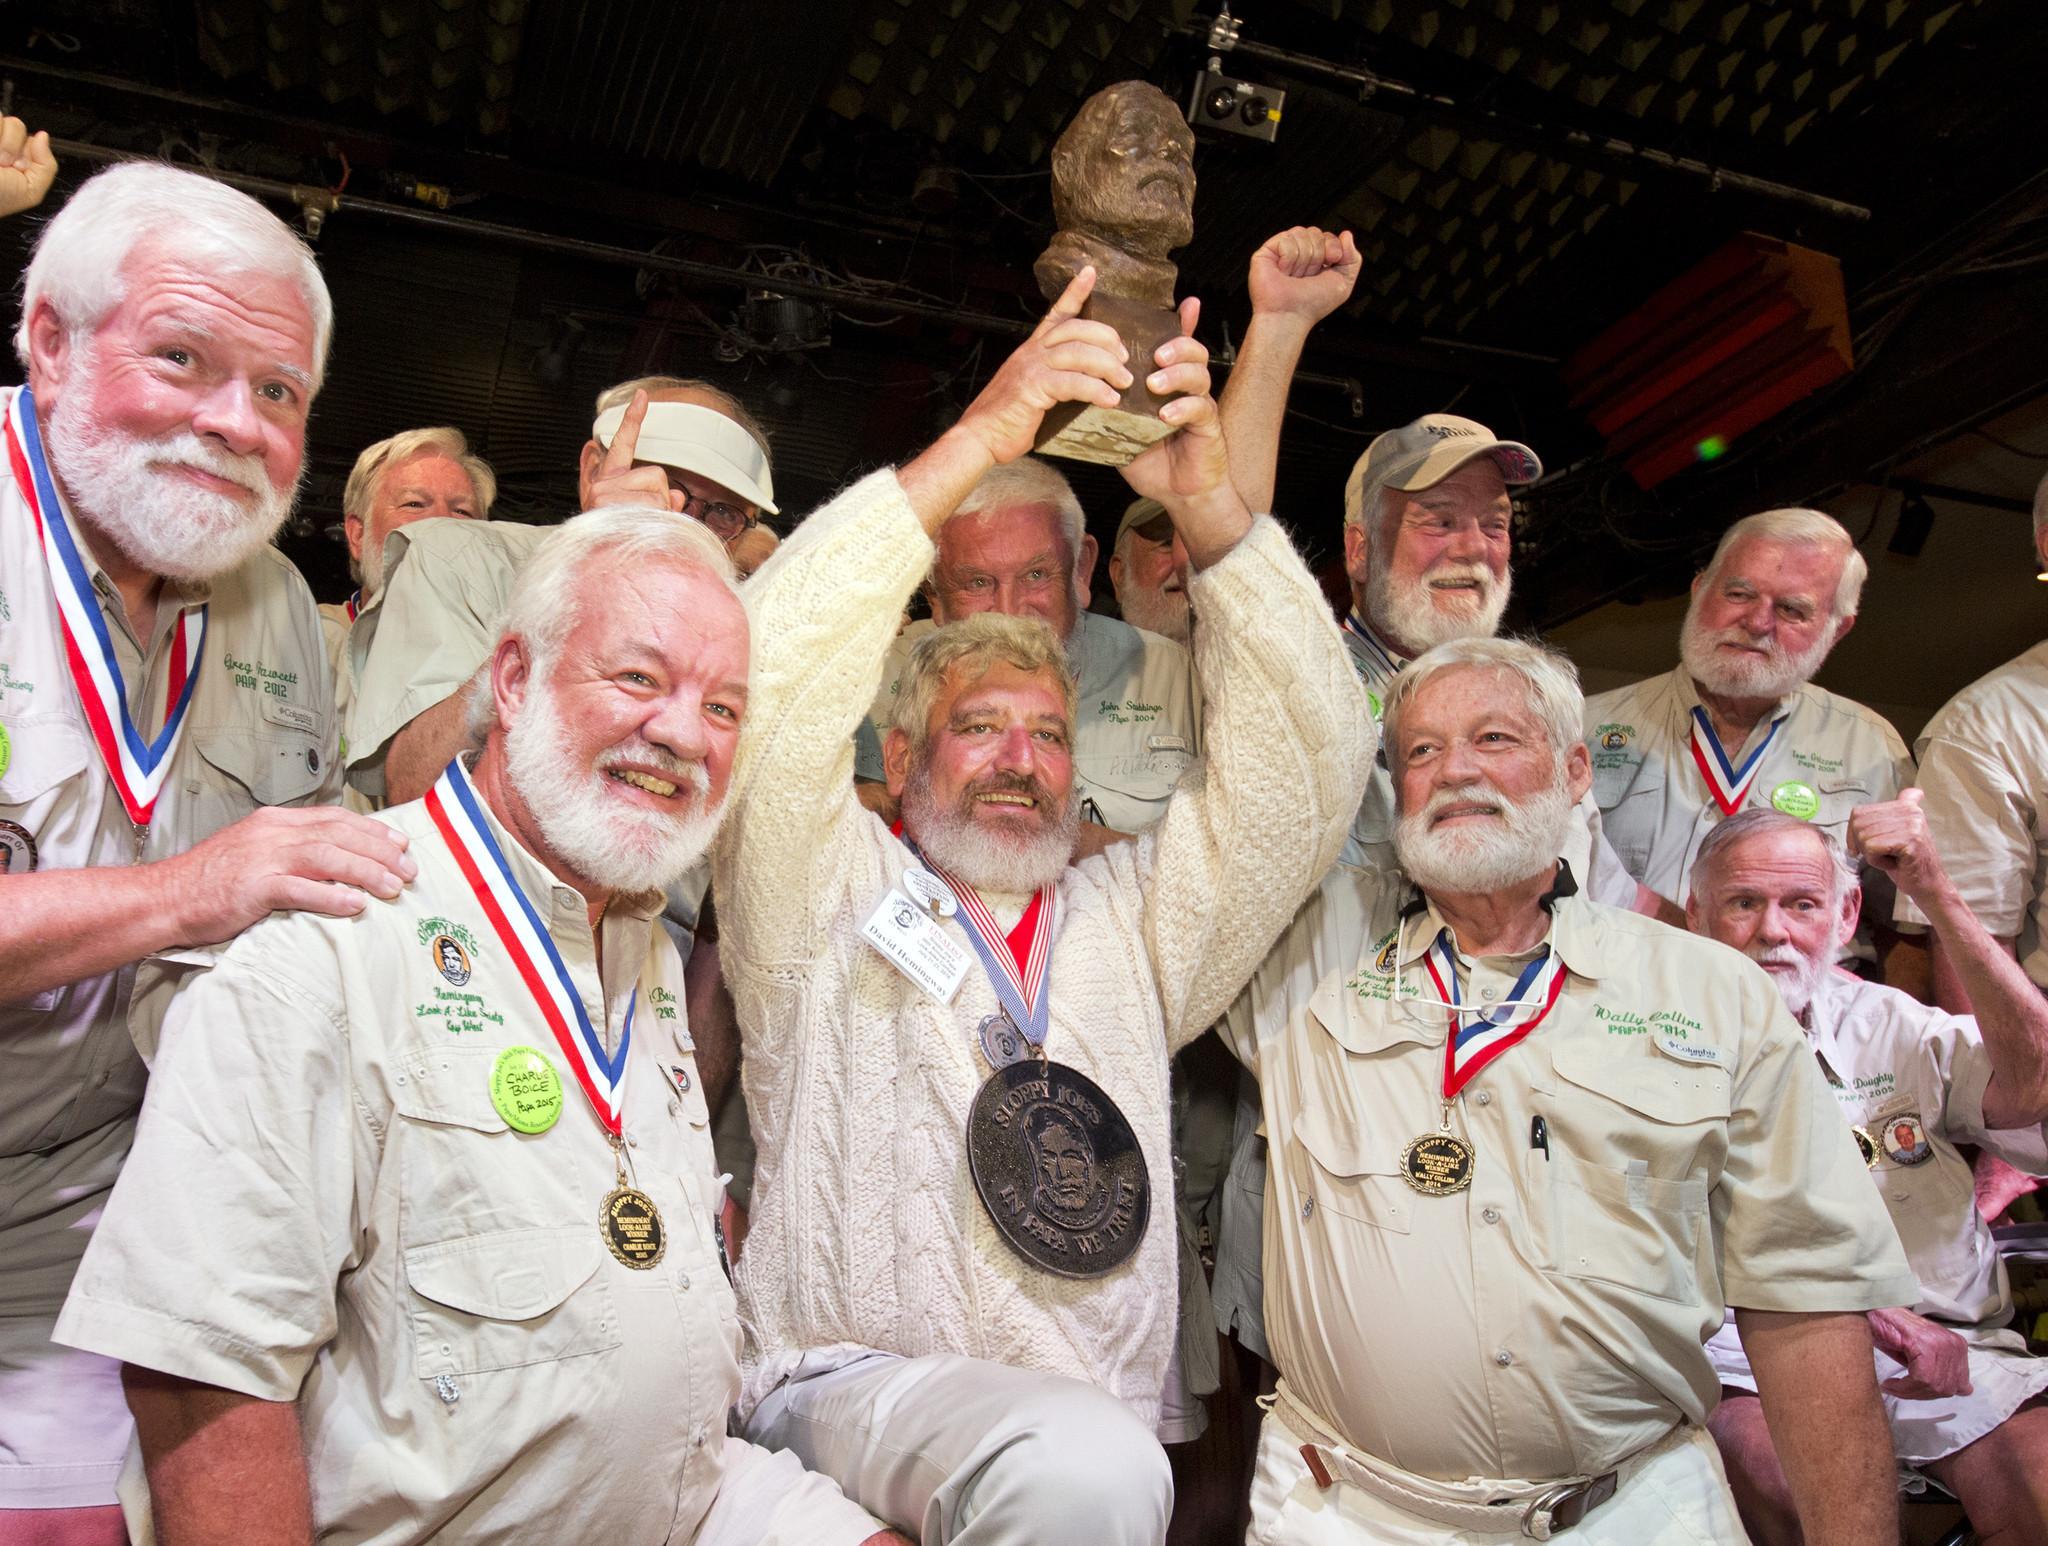 Ct-hemingway-wins-look-alike-contest-20160724